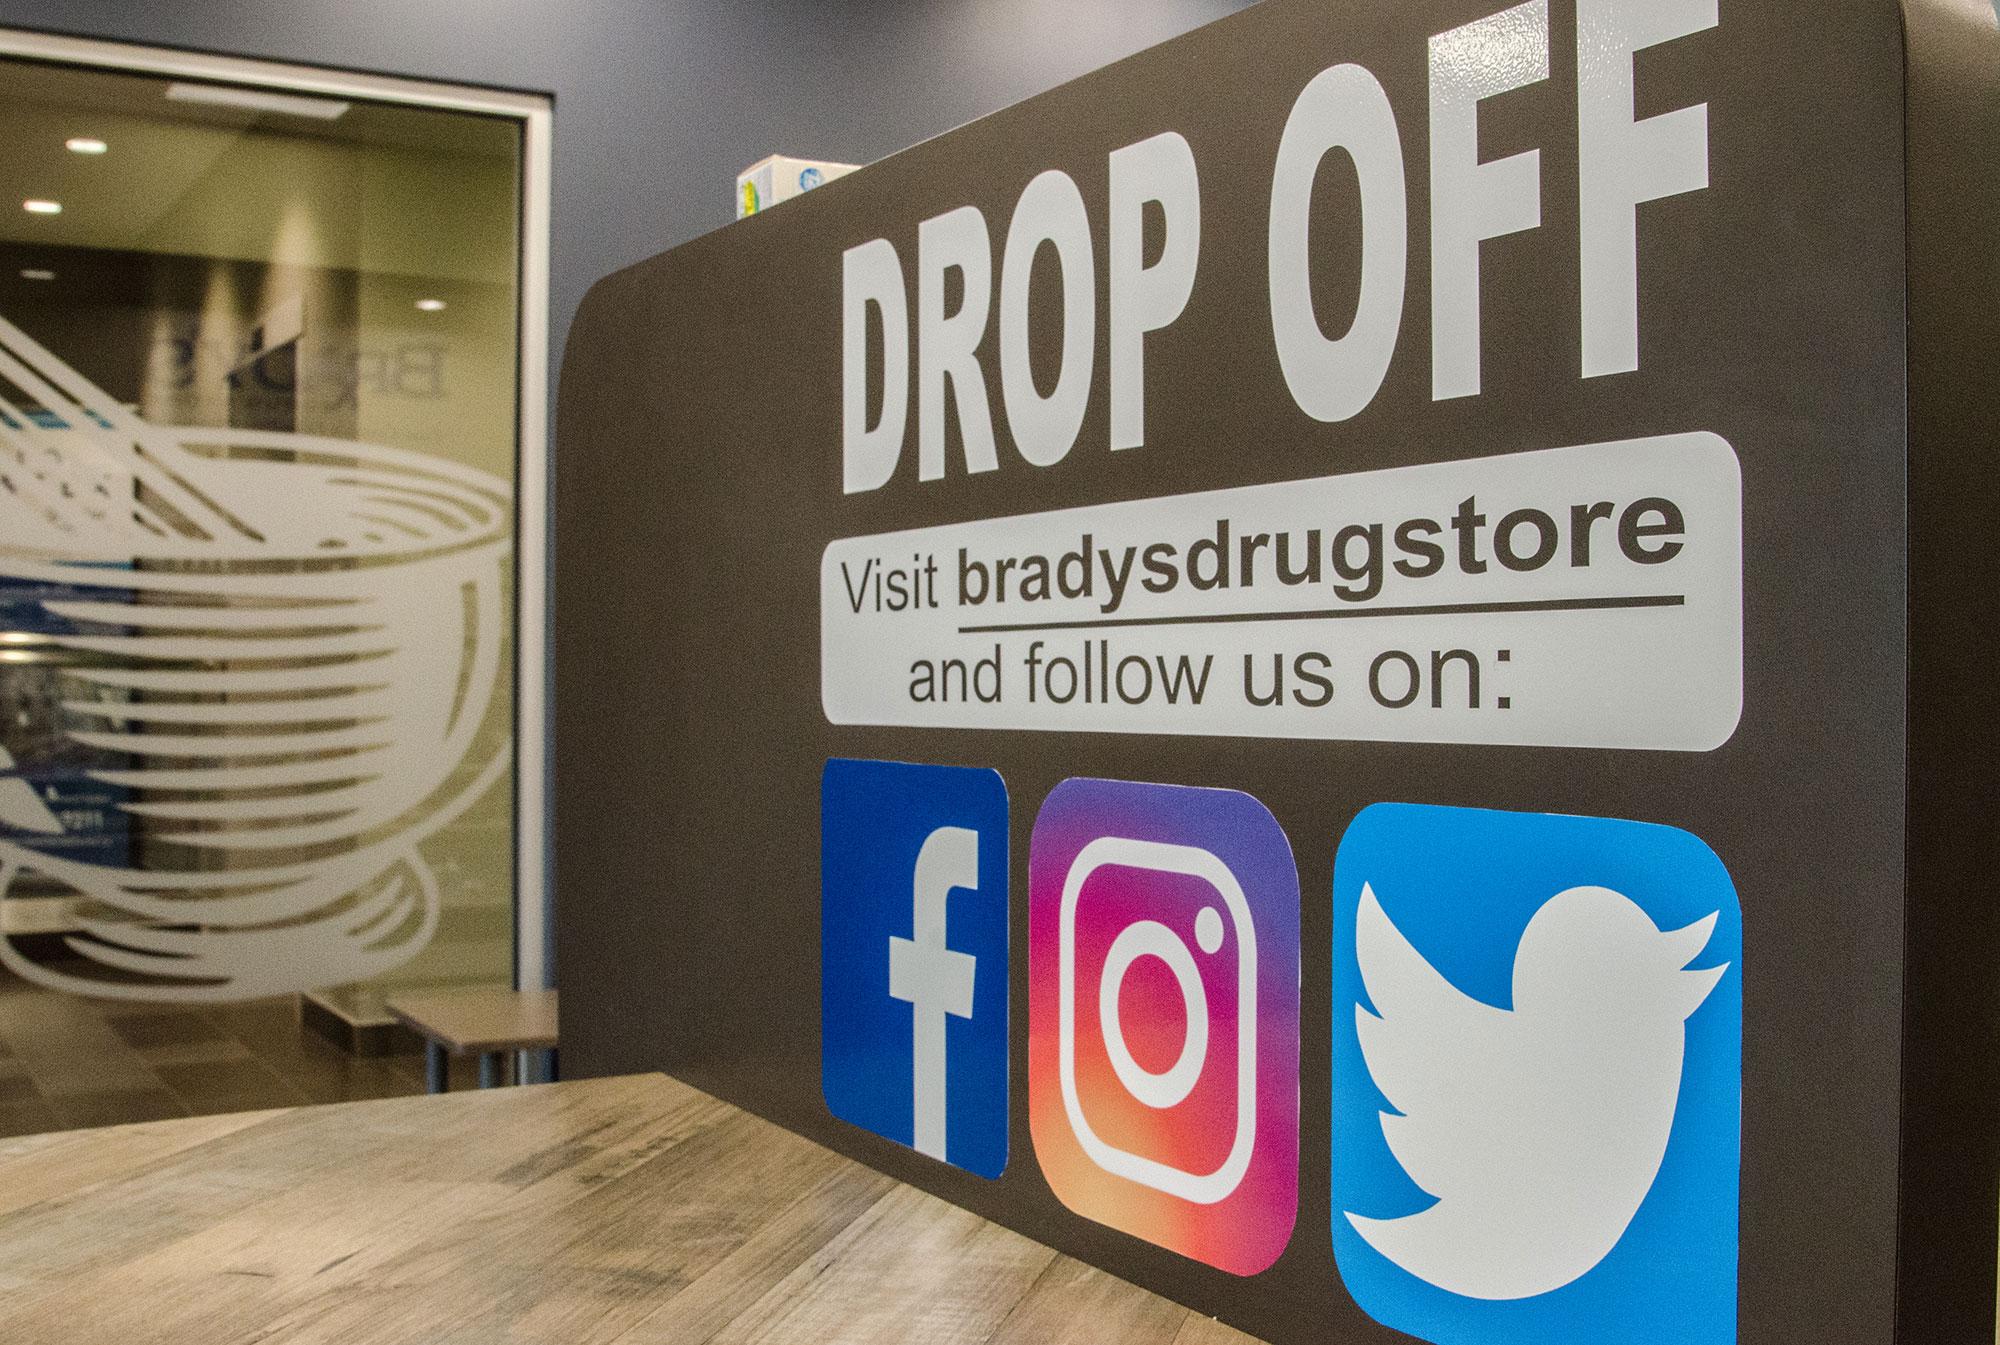 contacting Brady's Drug Store